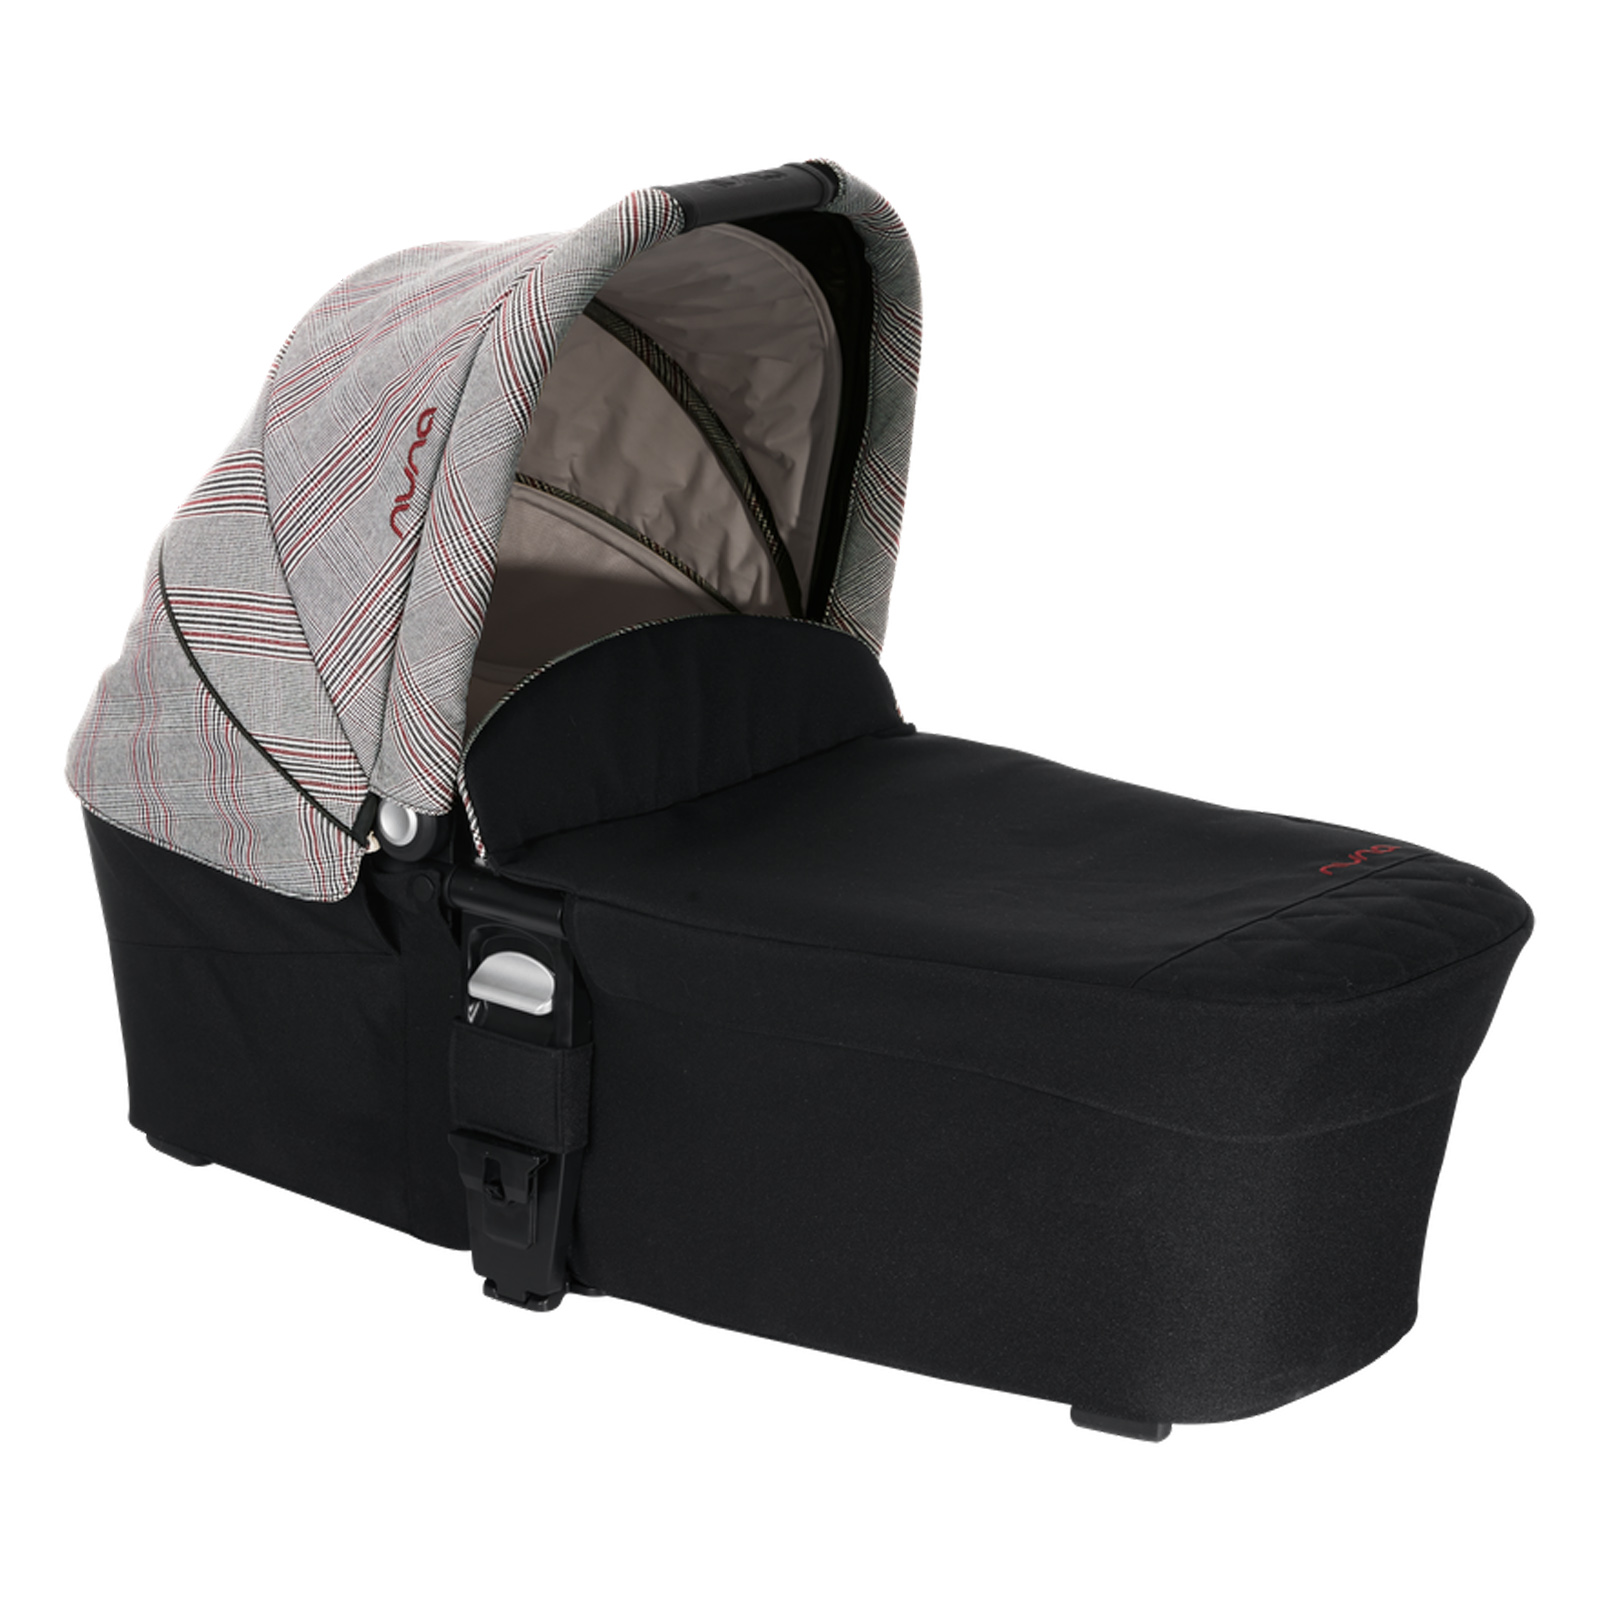 Nuna Mixx Next Pushchair Stroller & Carrycot - Ellis   Buy ...